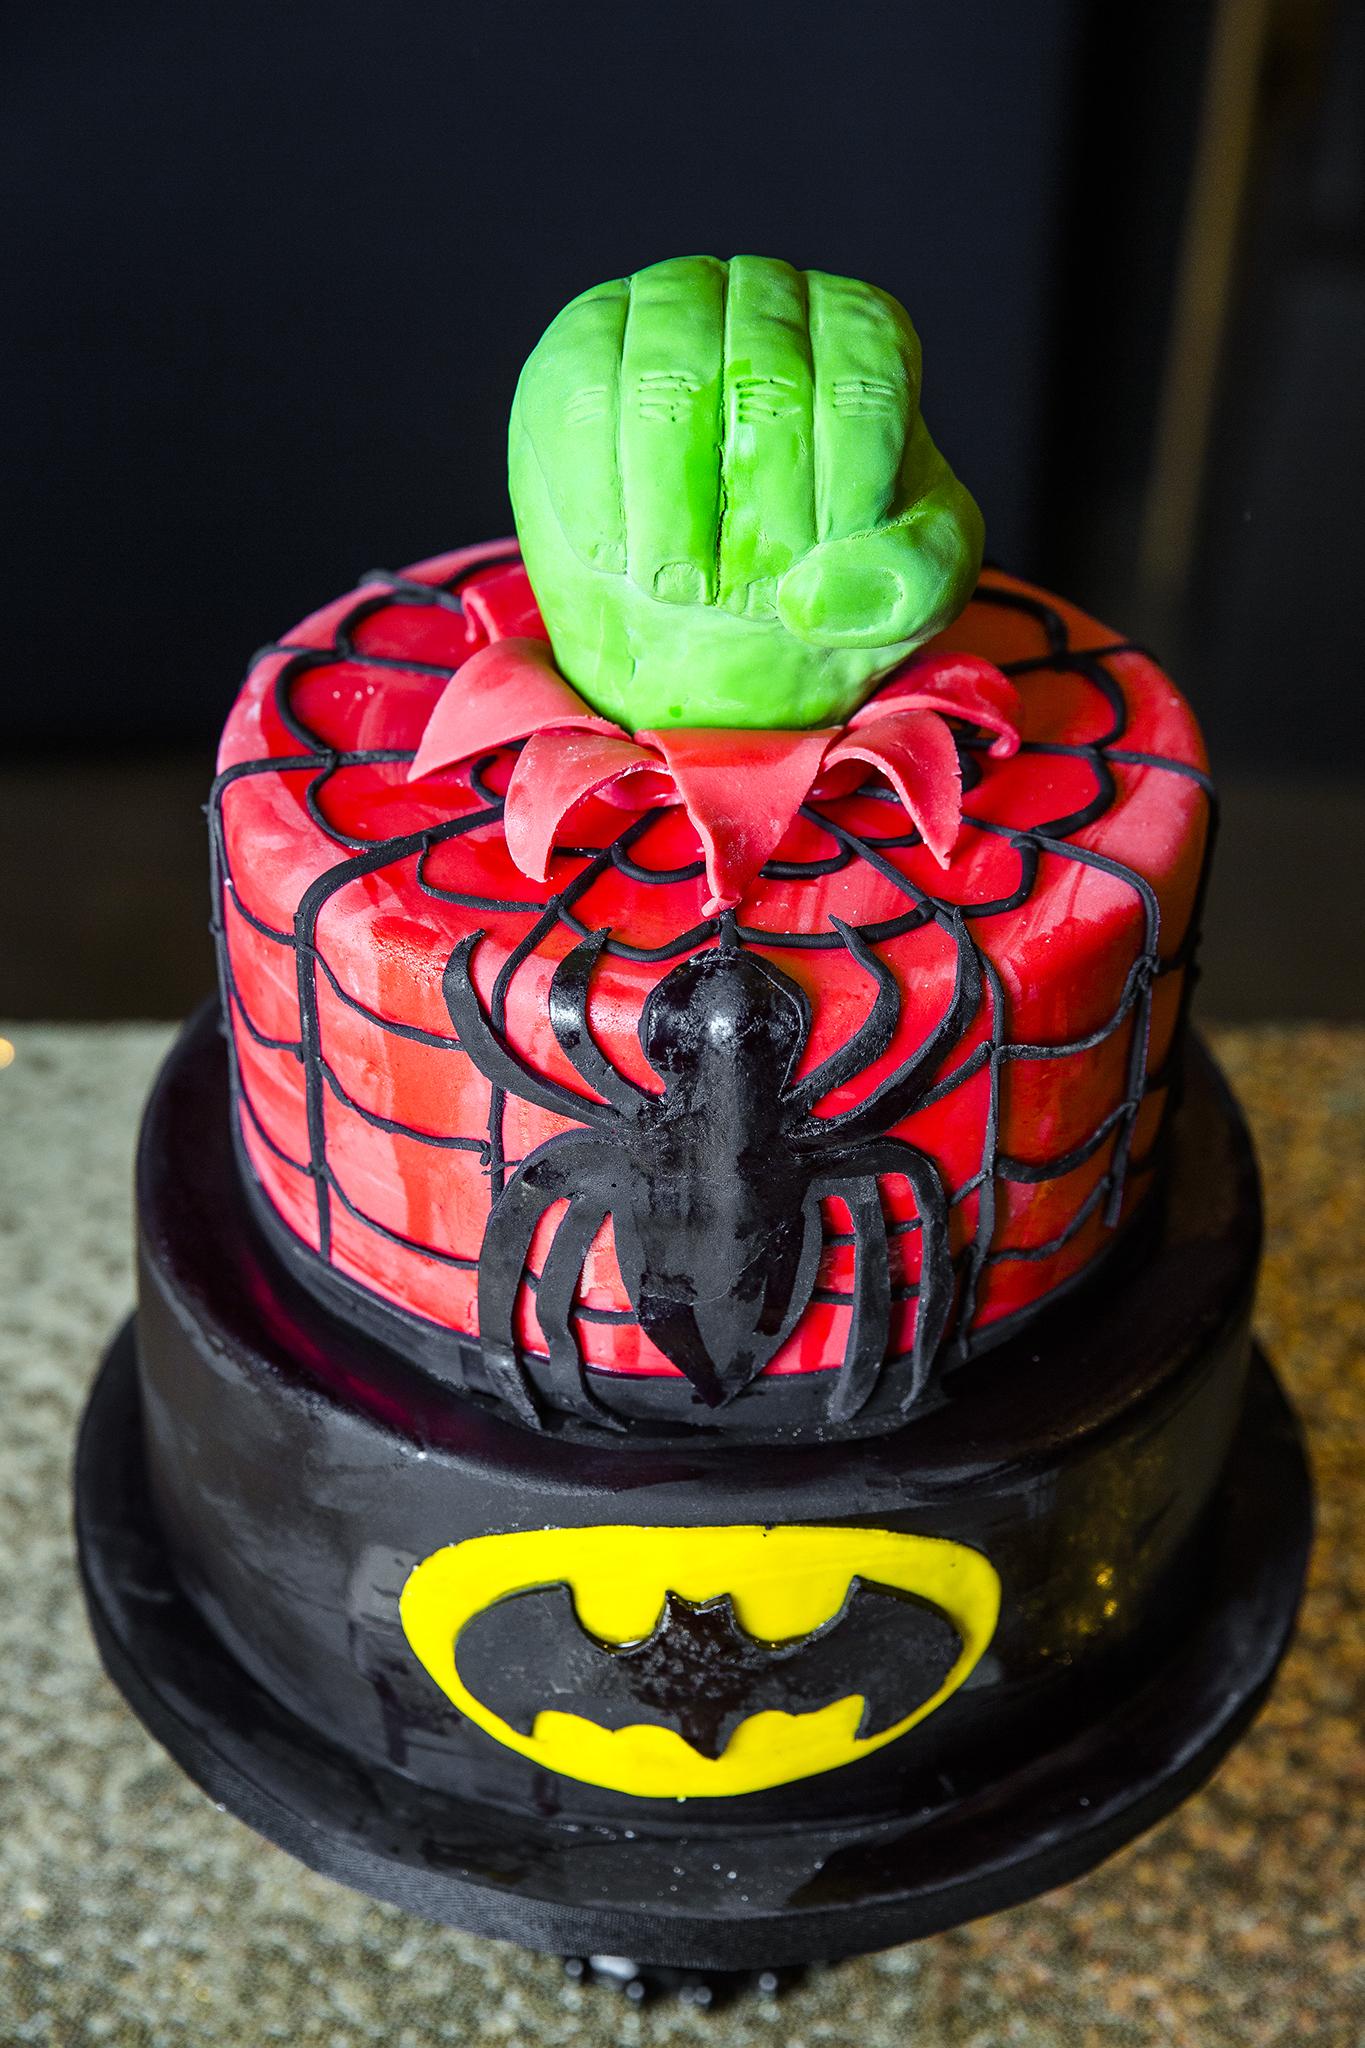 superhero cake, hulk, spiderman, batman, creative wedding cakes